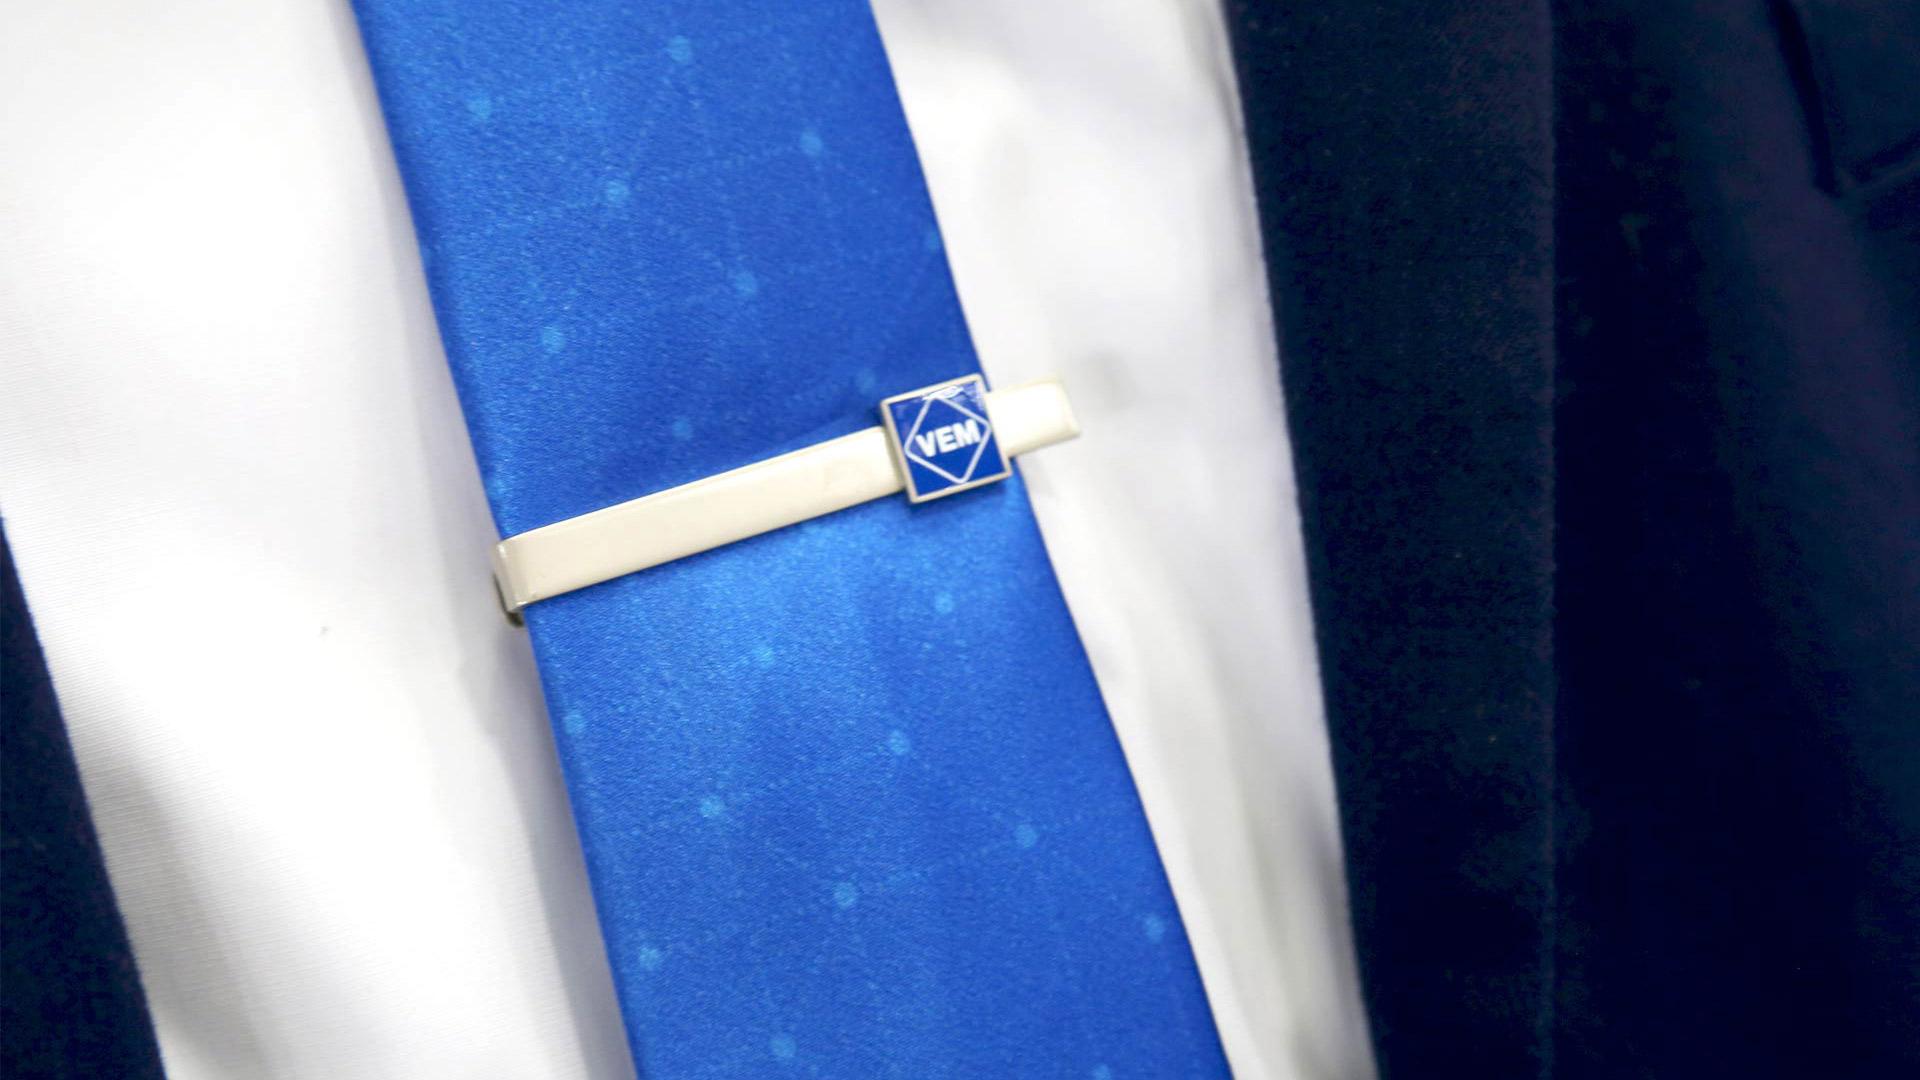 Messe-Kleidung Krawattennadel